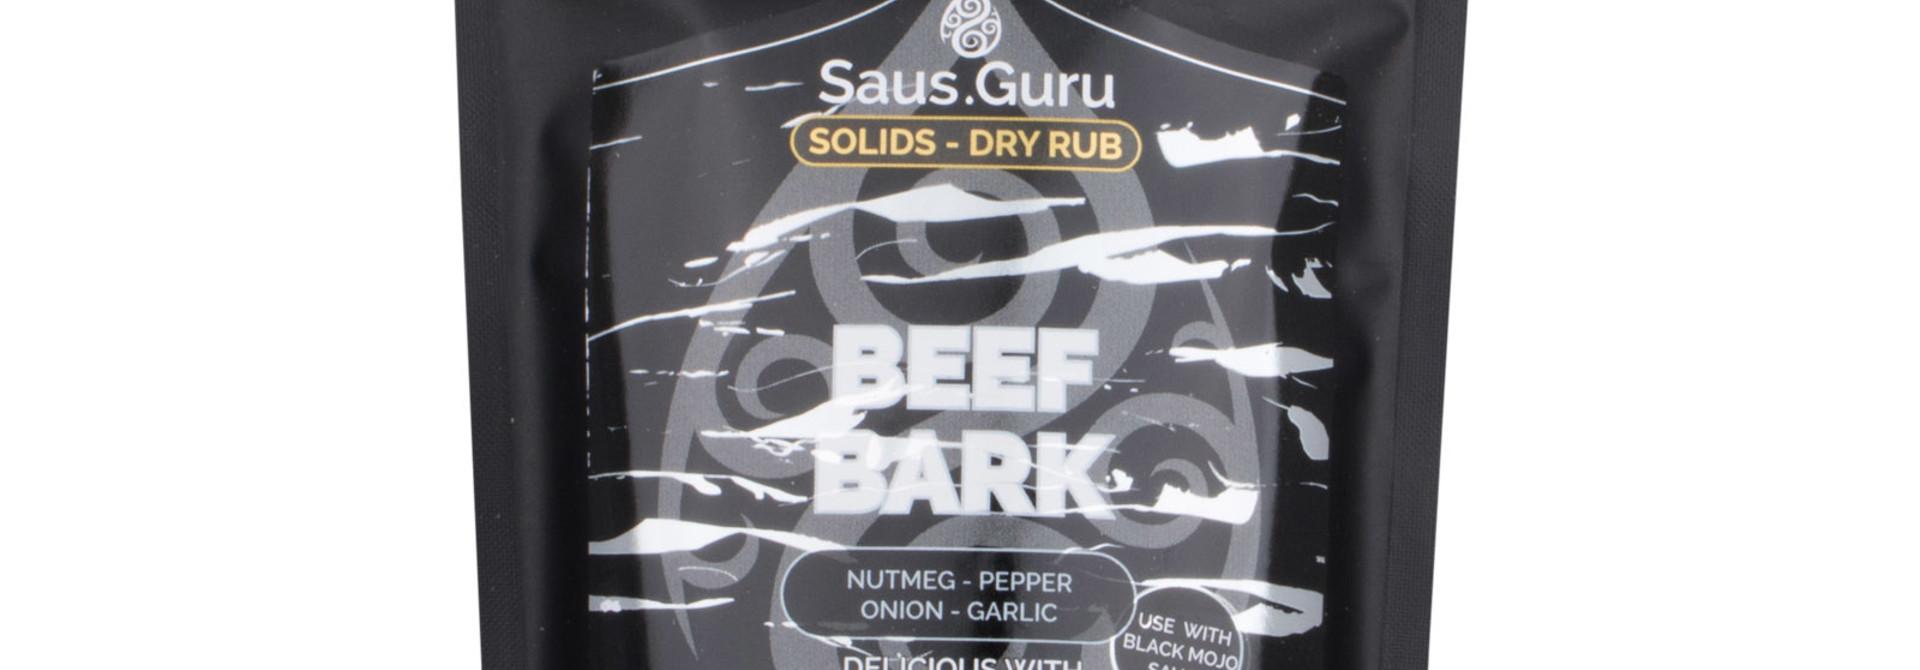 Saus.Guru's Beef Bark